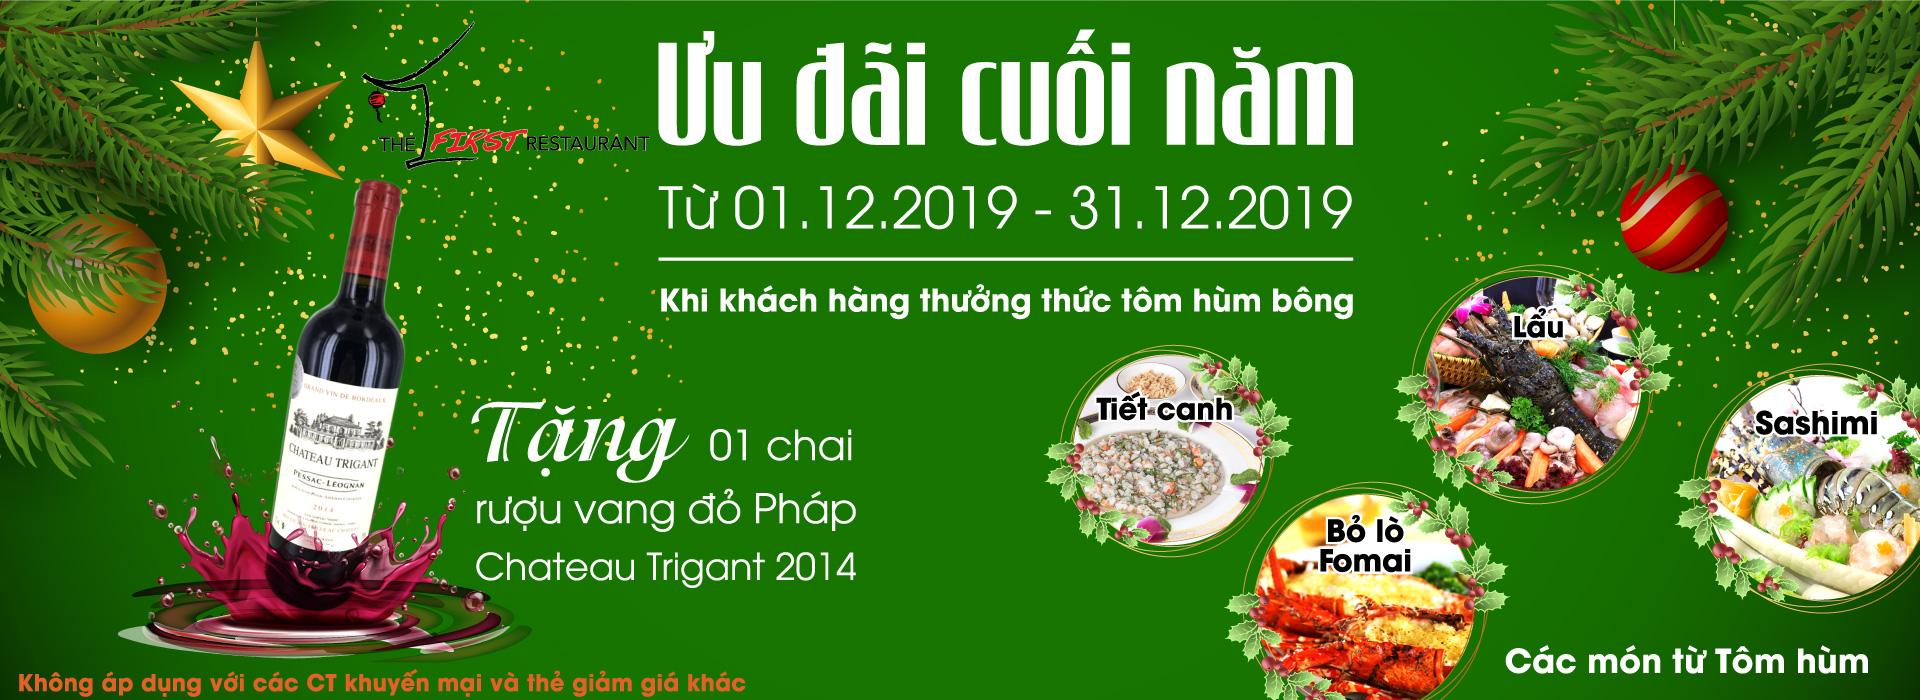 Banner DN Uu Dai Cuoi Nam